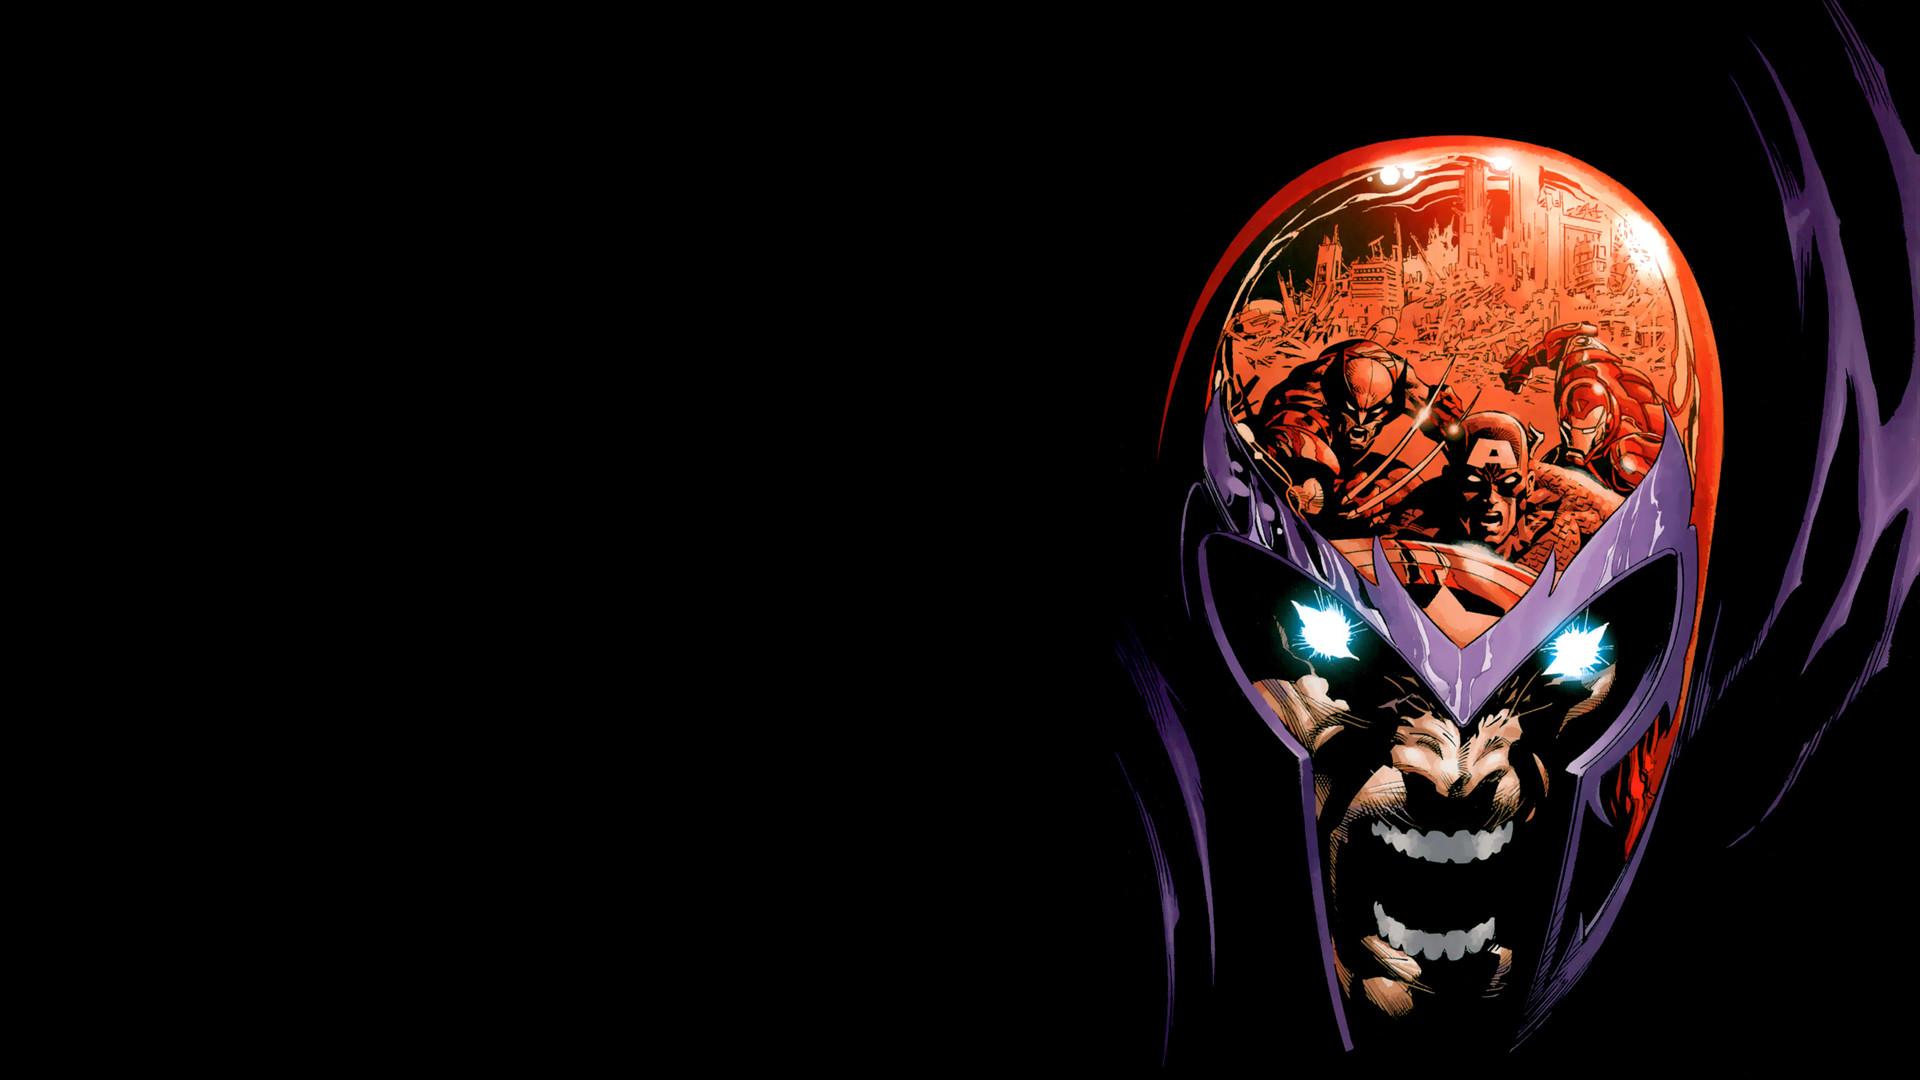 Comic Book Wallpaper For My Desktop (61+ Images